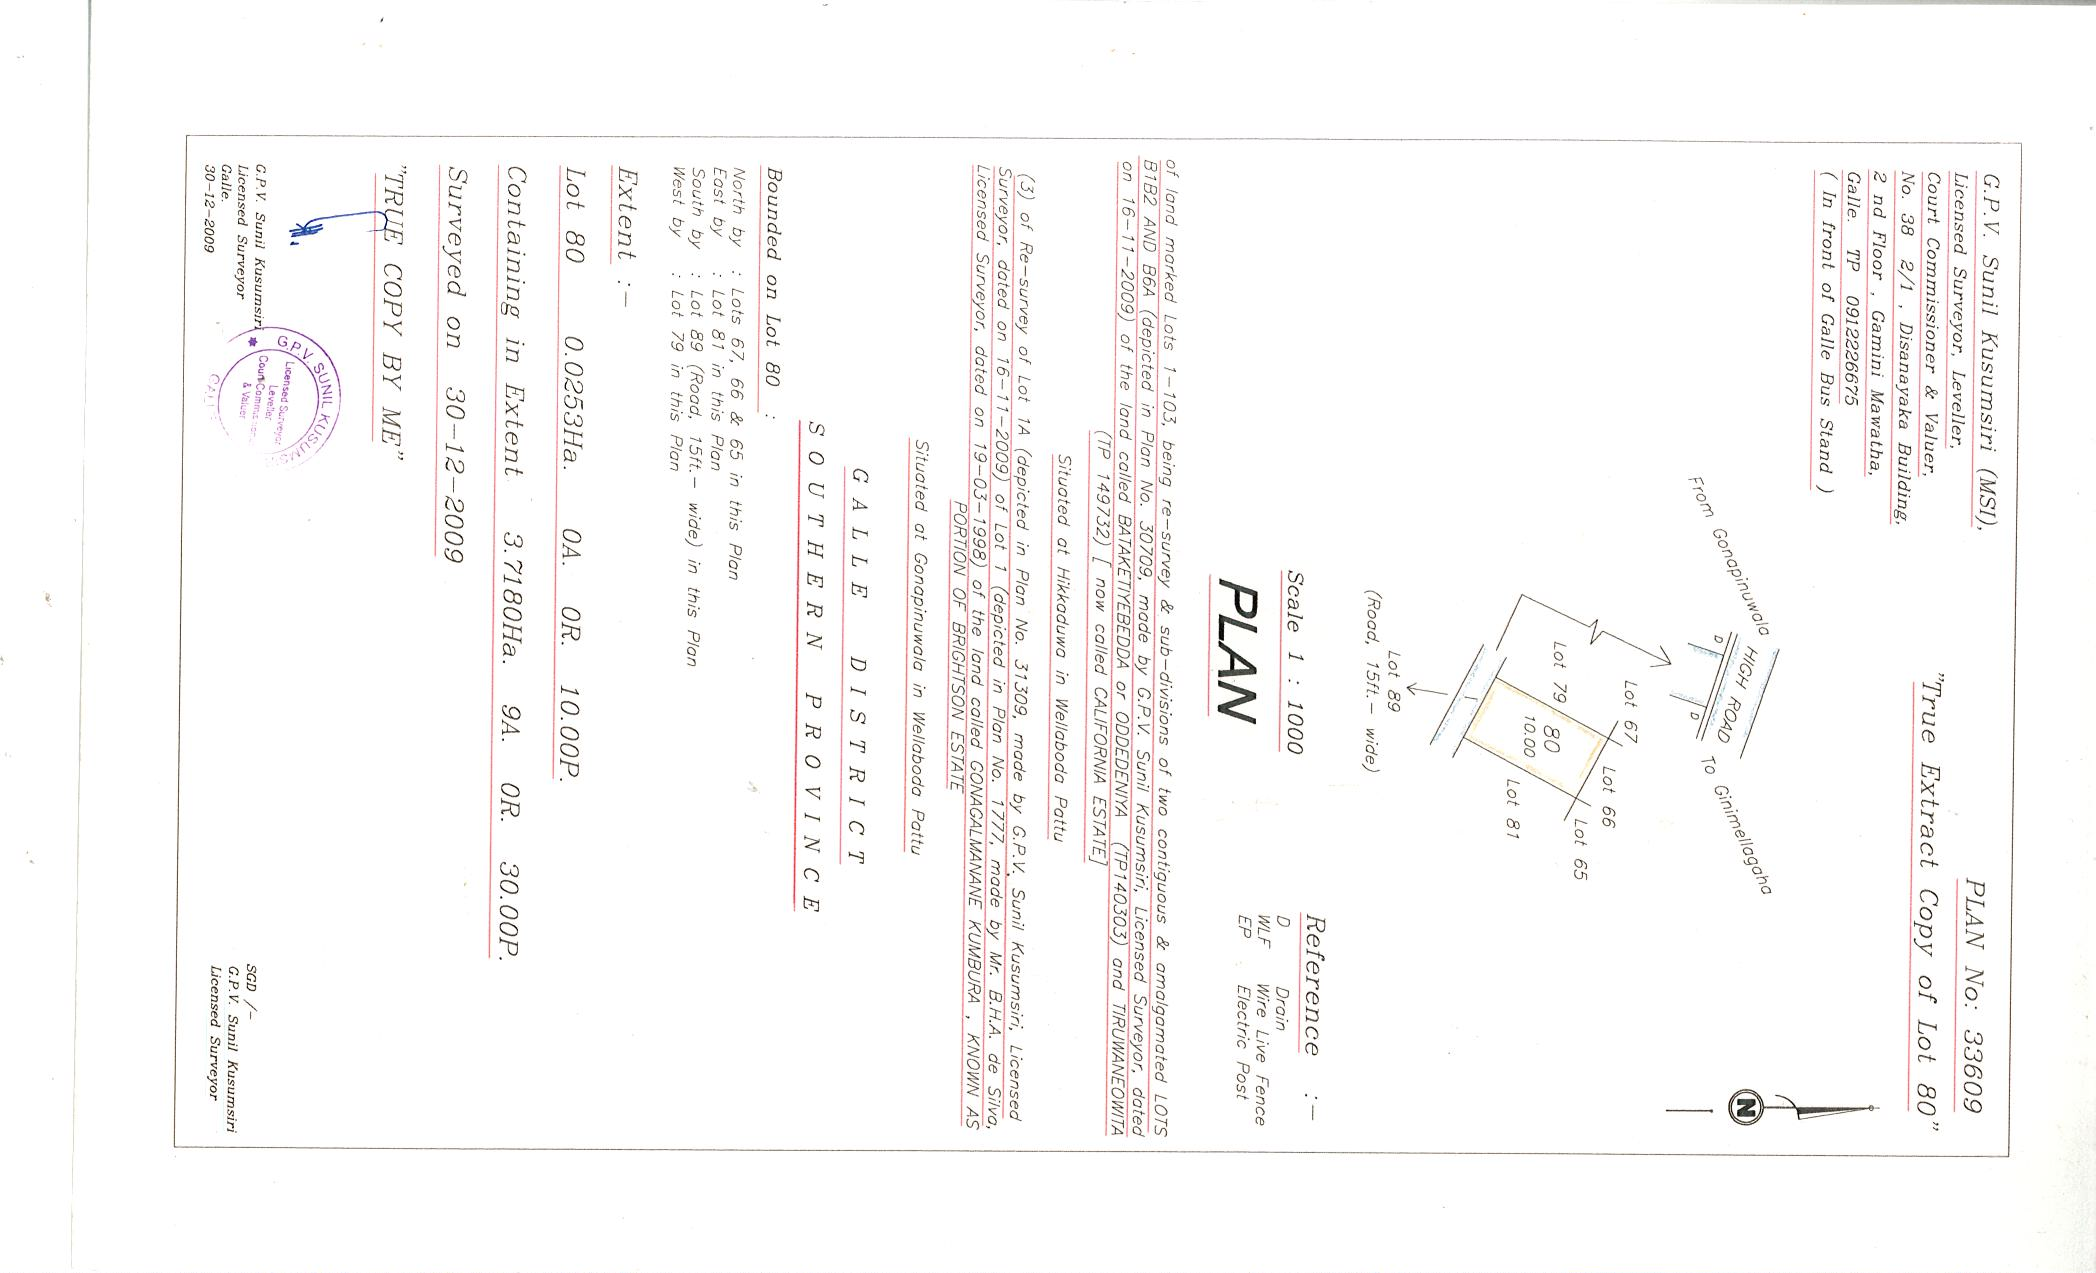 surveyplanof20perchPage21600183137